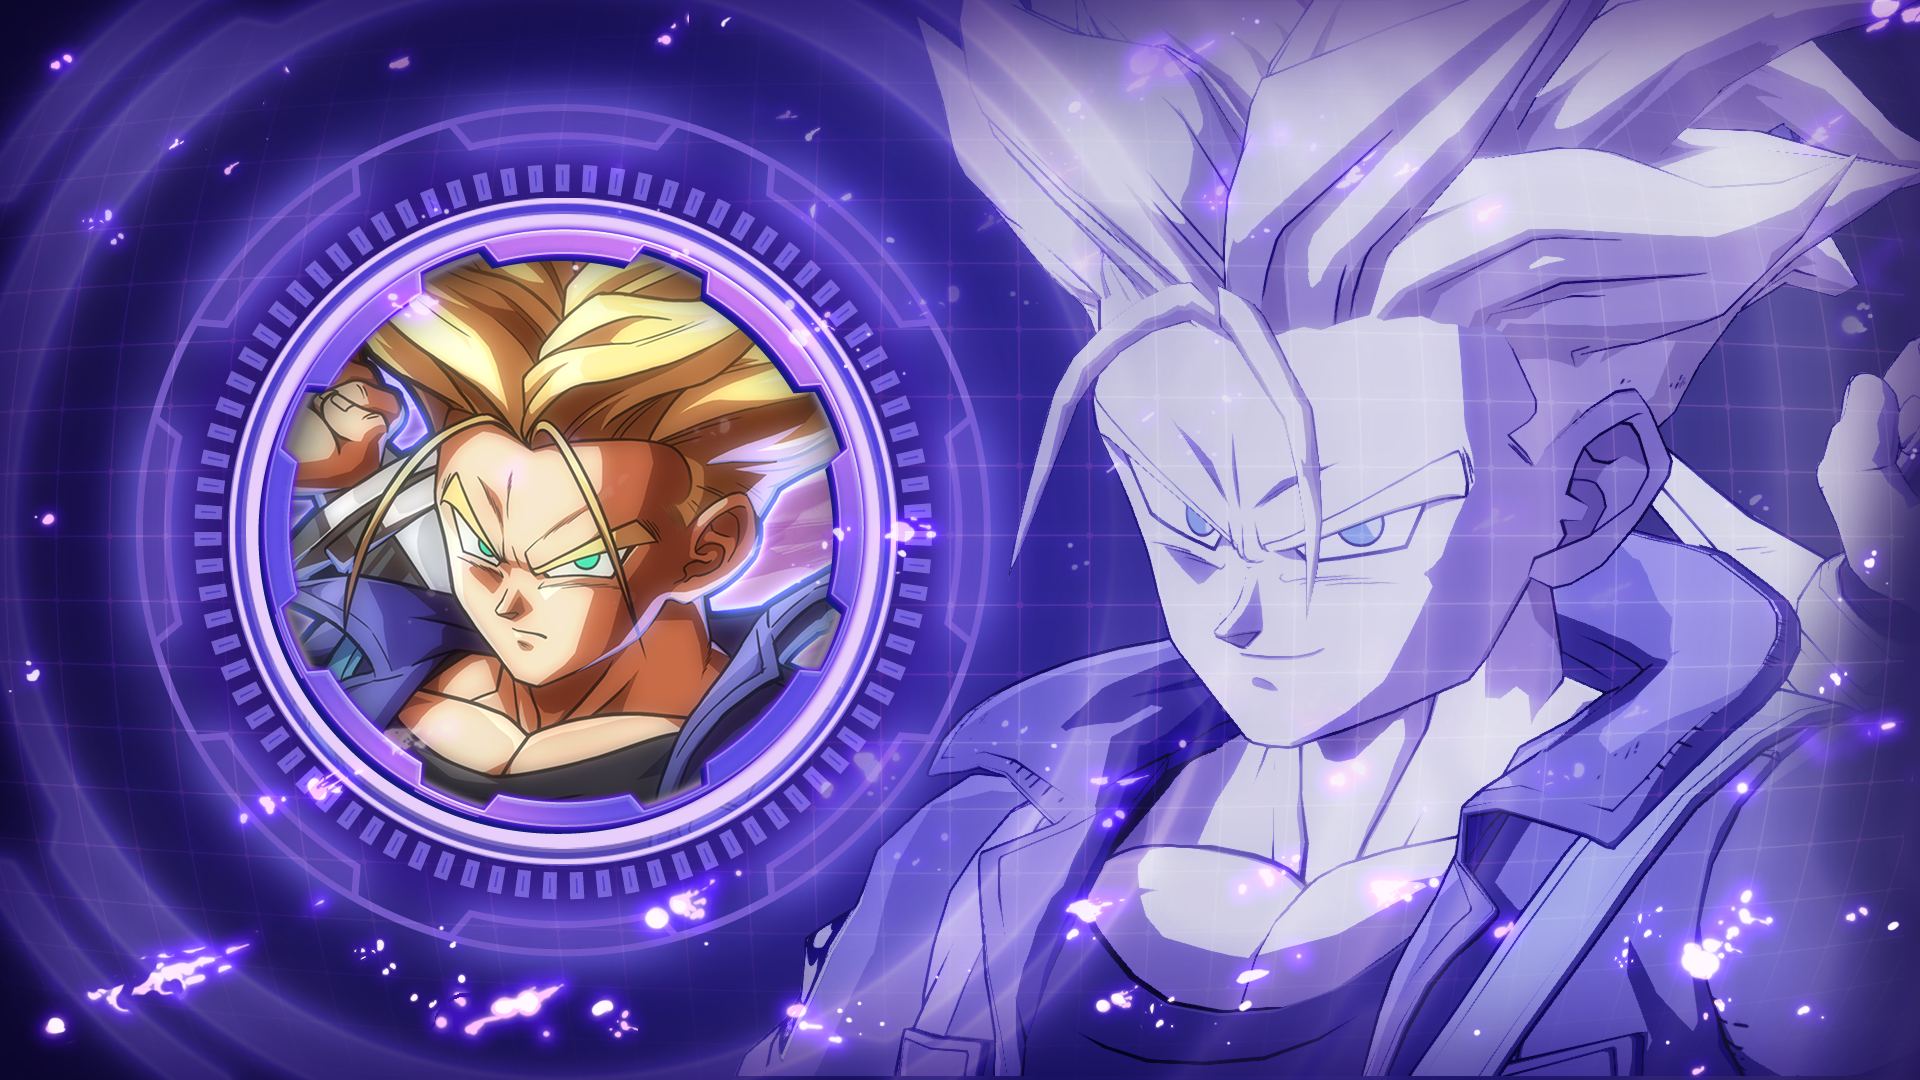 Goku Isn't the Only Super Saiyan...